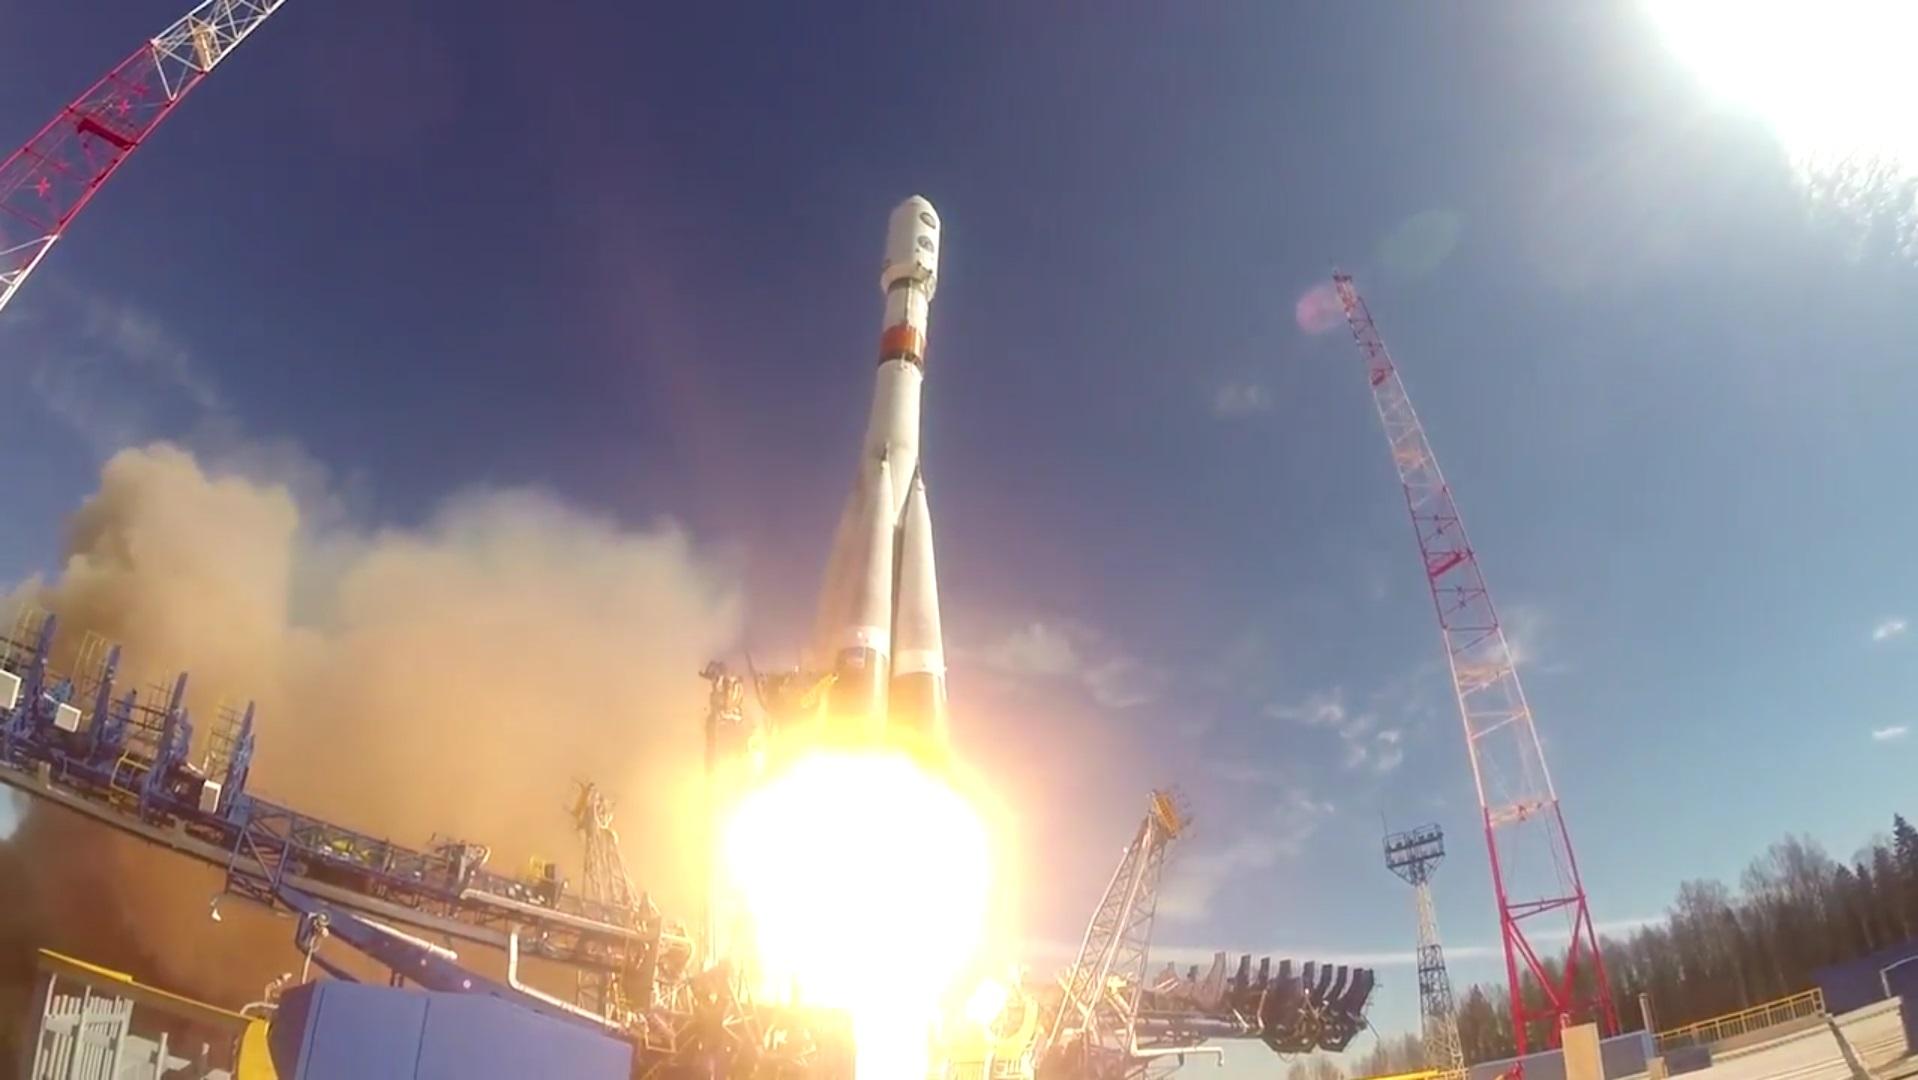 russian space shuttle base